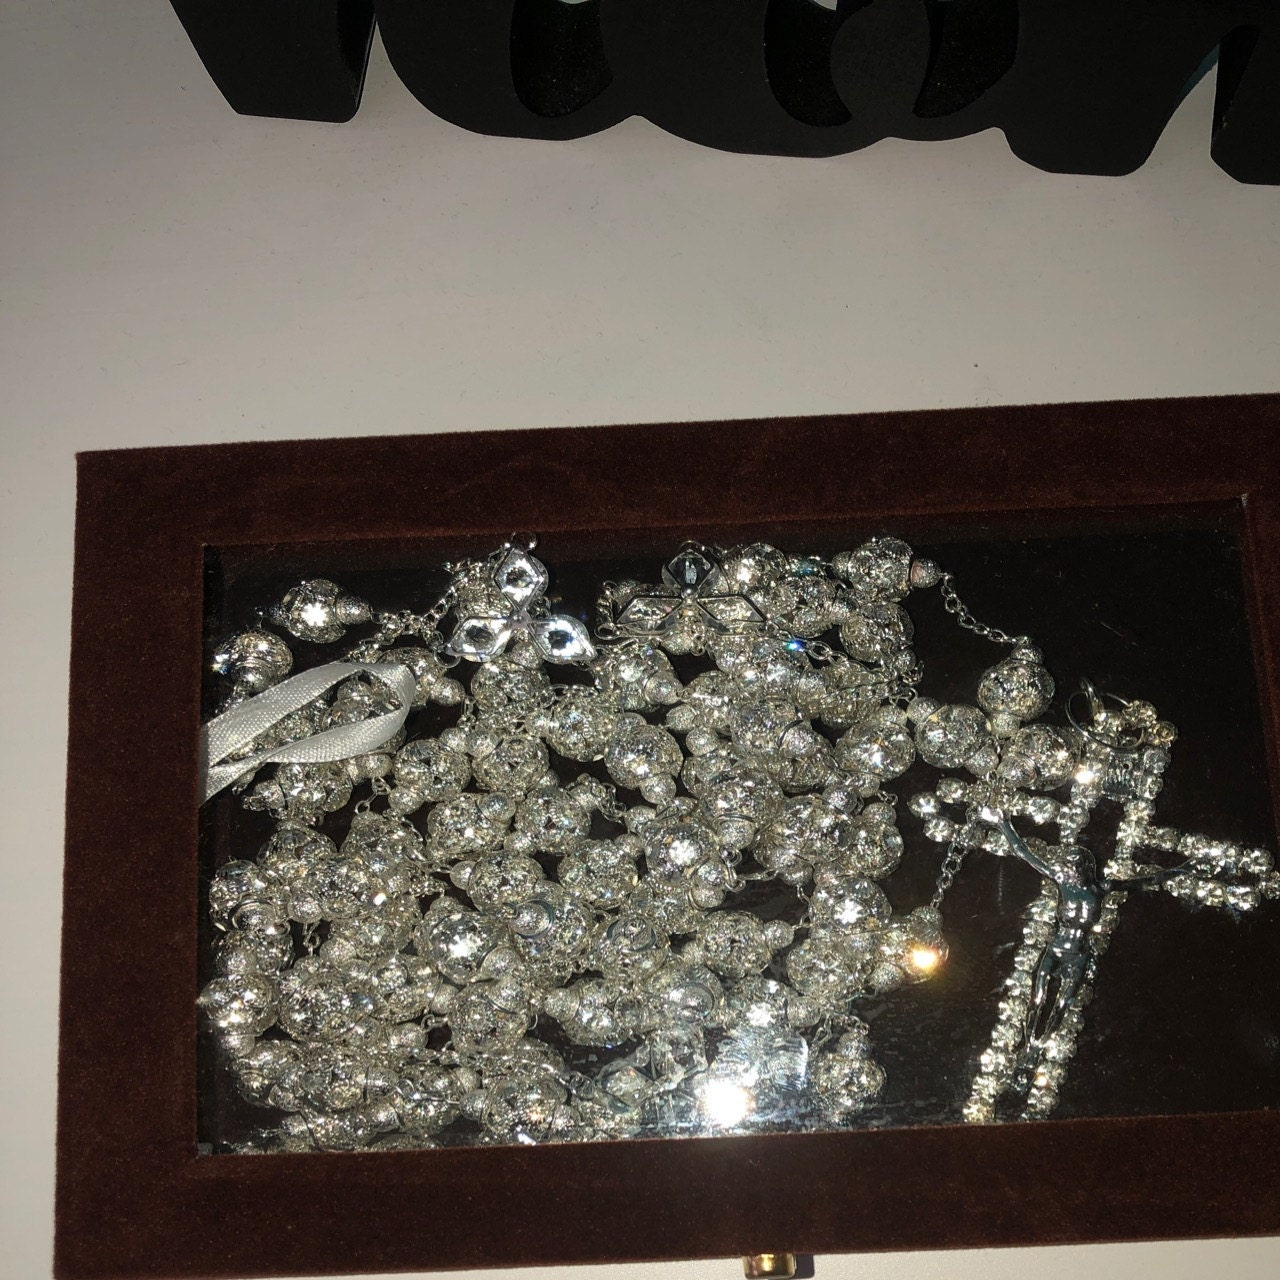 Esthela Alaniz added a photo of their purchase